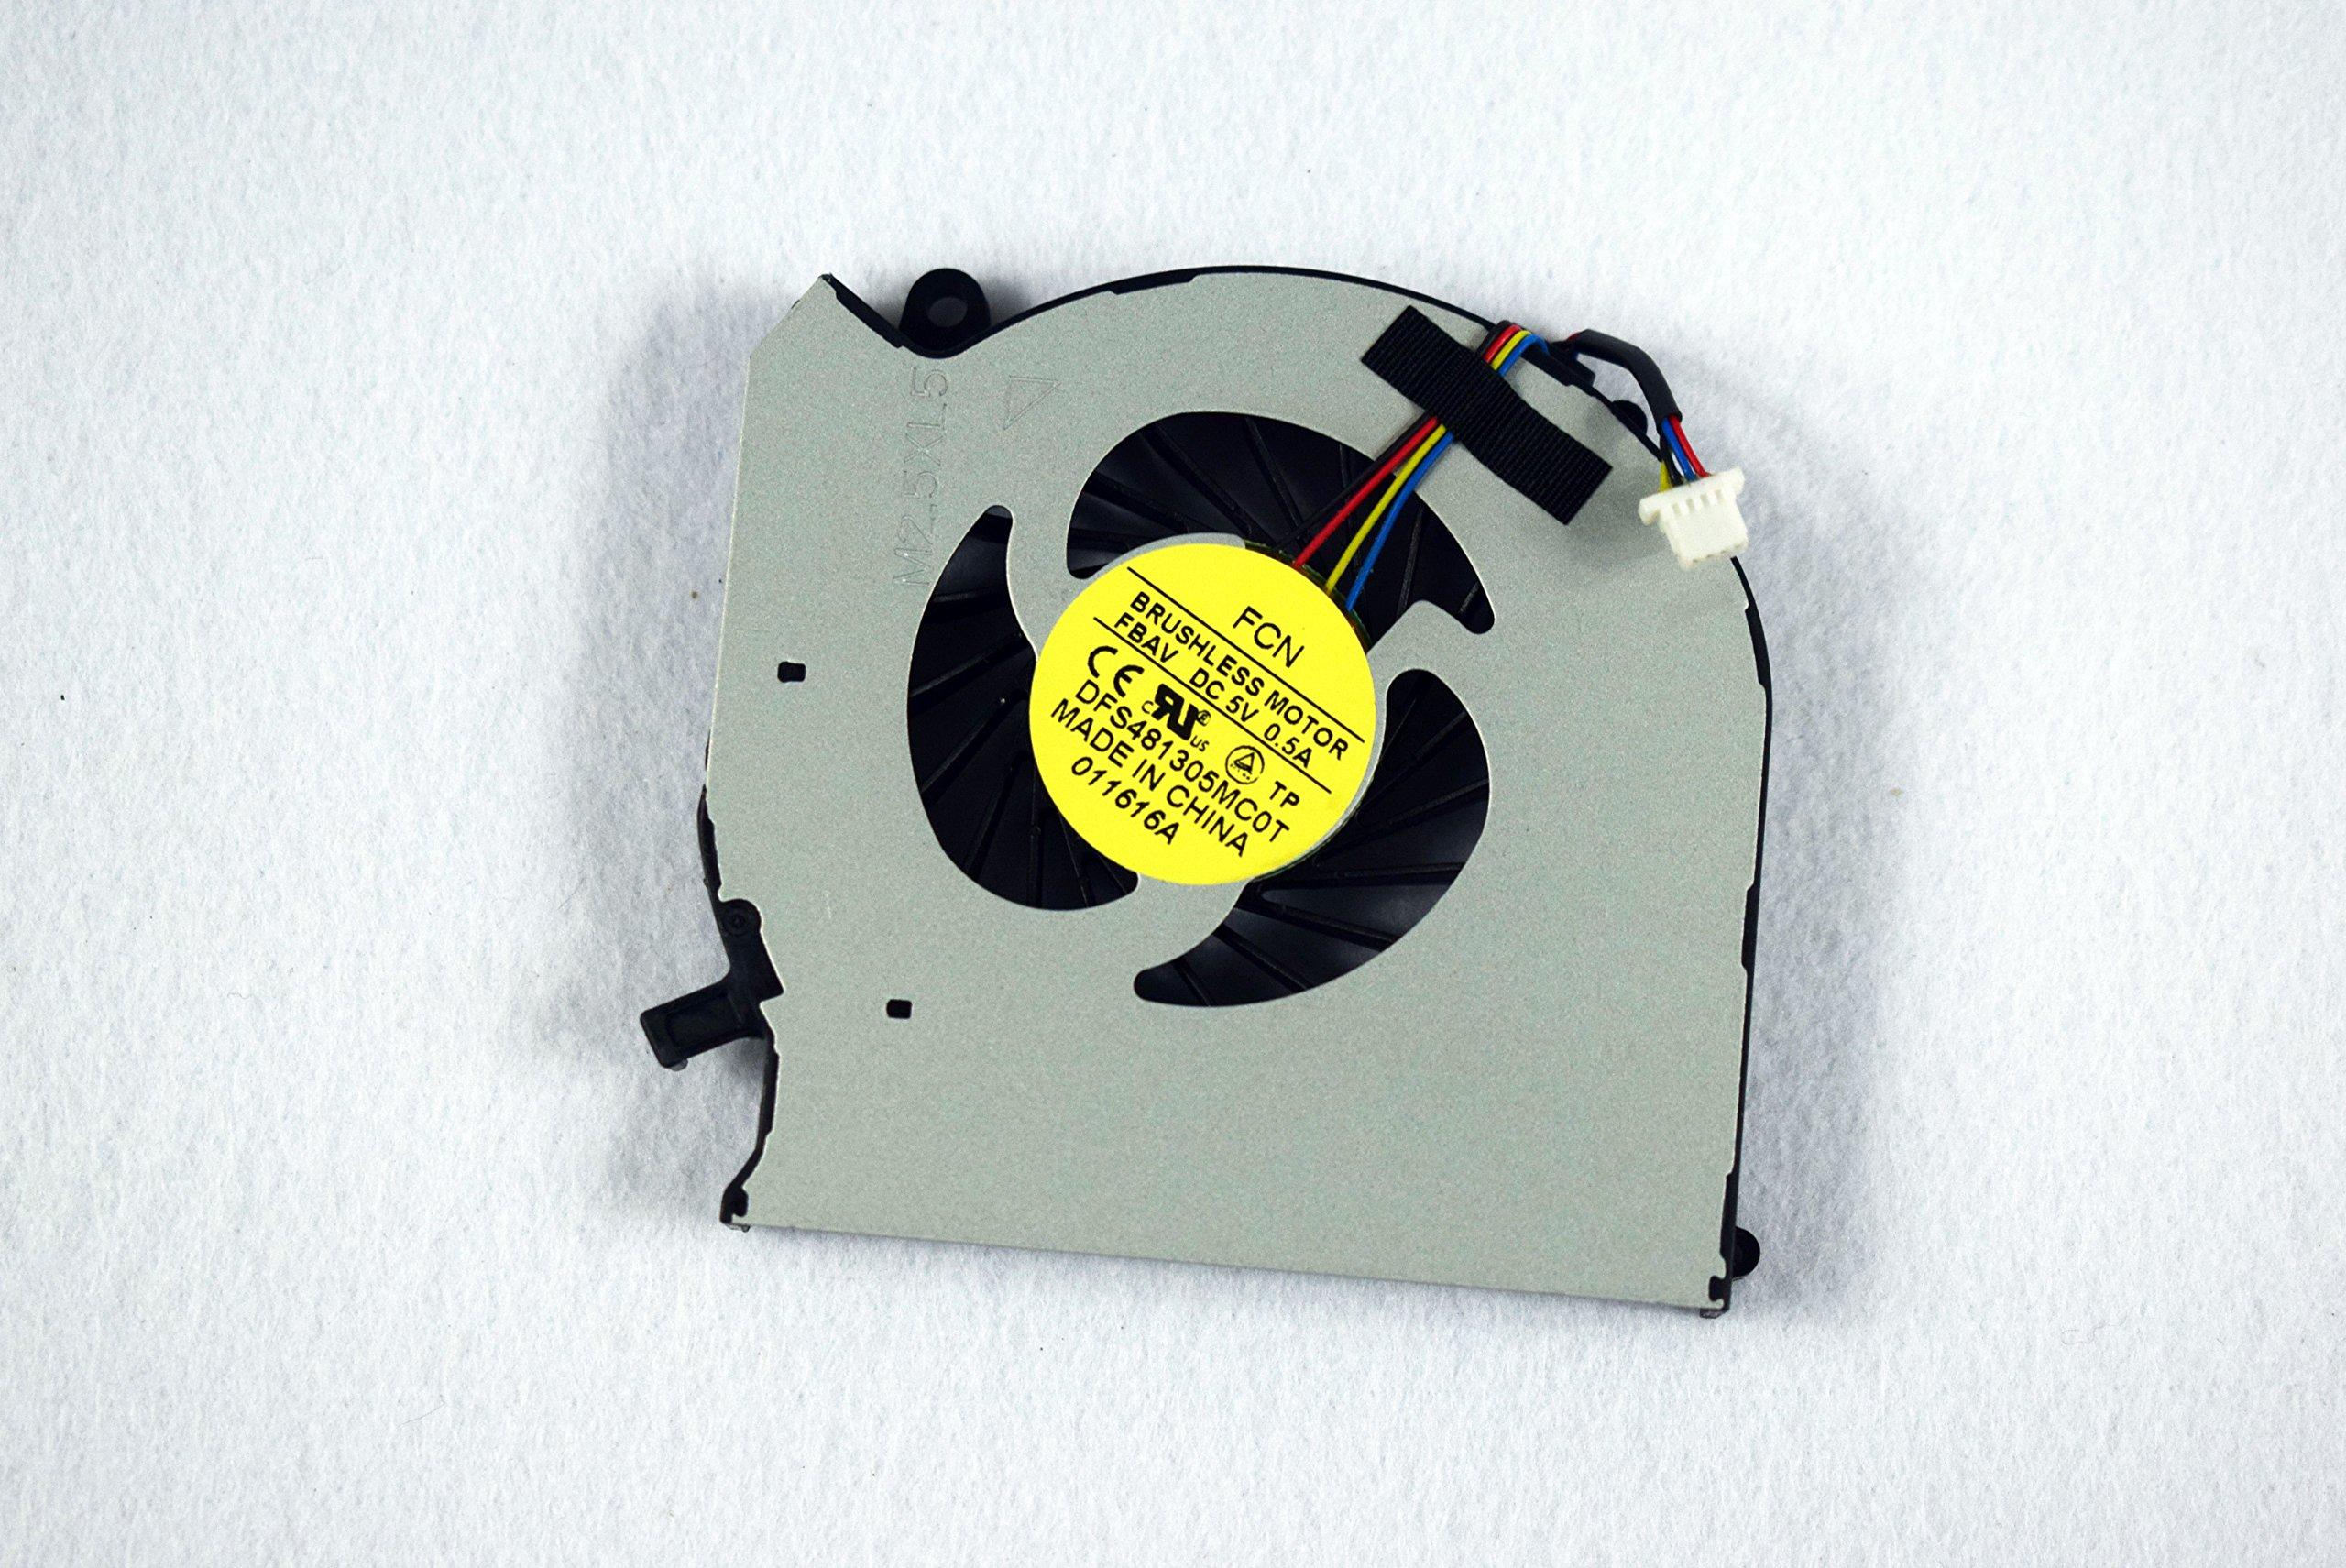 Cpu Cooling Fan /& Heatsink For HP Pavilion dv6-6110us dv6-6108us dv6-6117dx